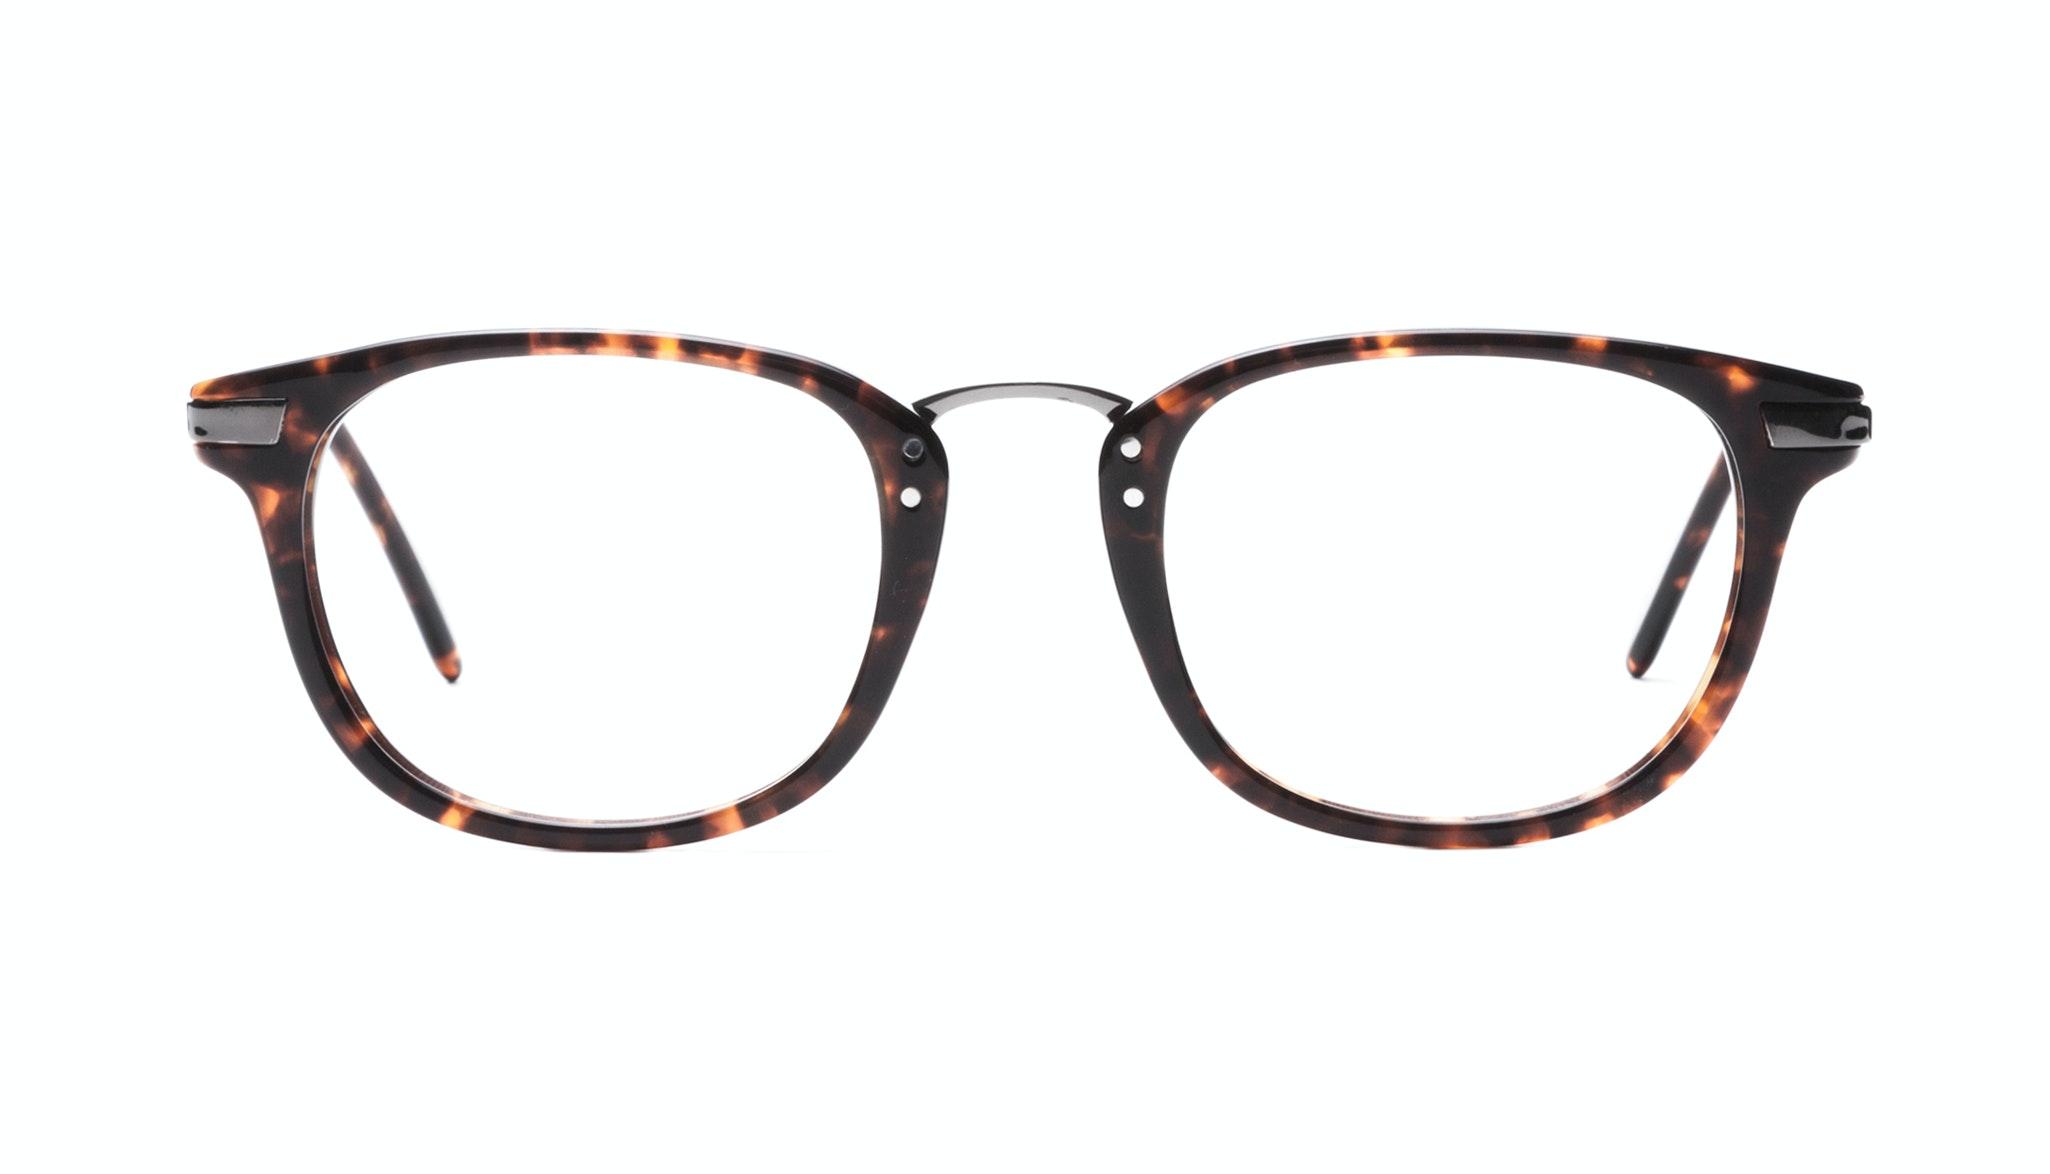 Affordable Fashion Glasses Rectangle Eyeglasses Men Women Daze Sepia Front